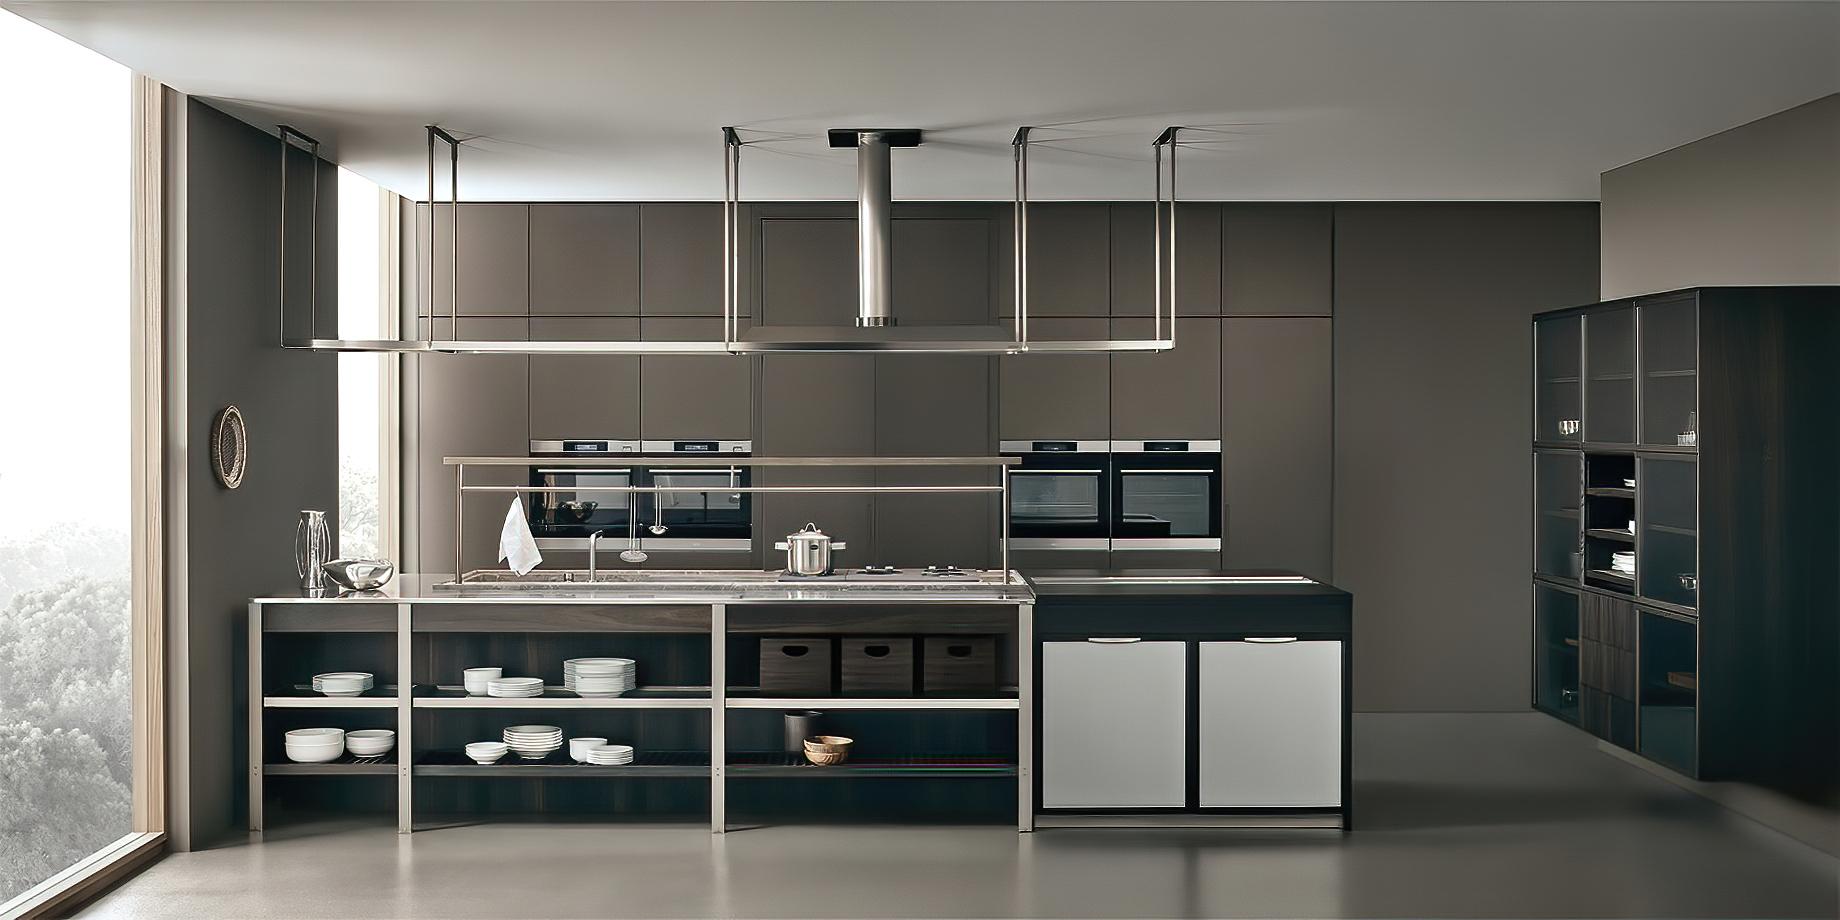 K-lab Contemporary Kitchen Ernestomeda Italy – Giuseppe Bavuso – K-System Island Kitchen Hood